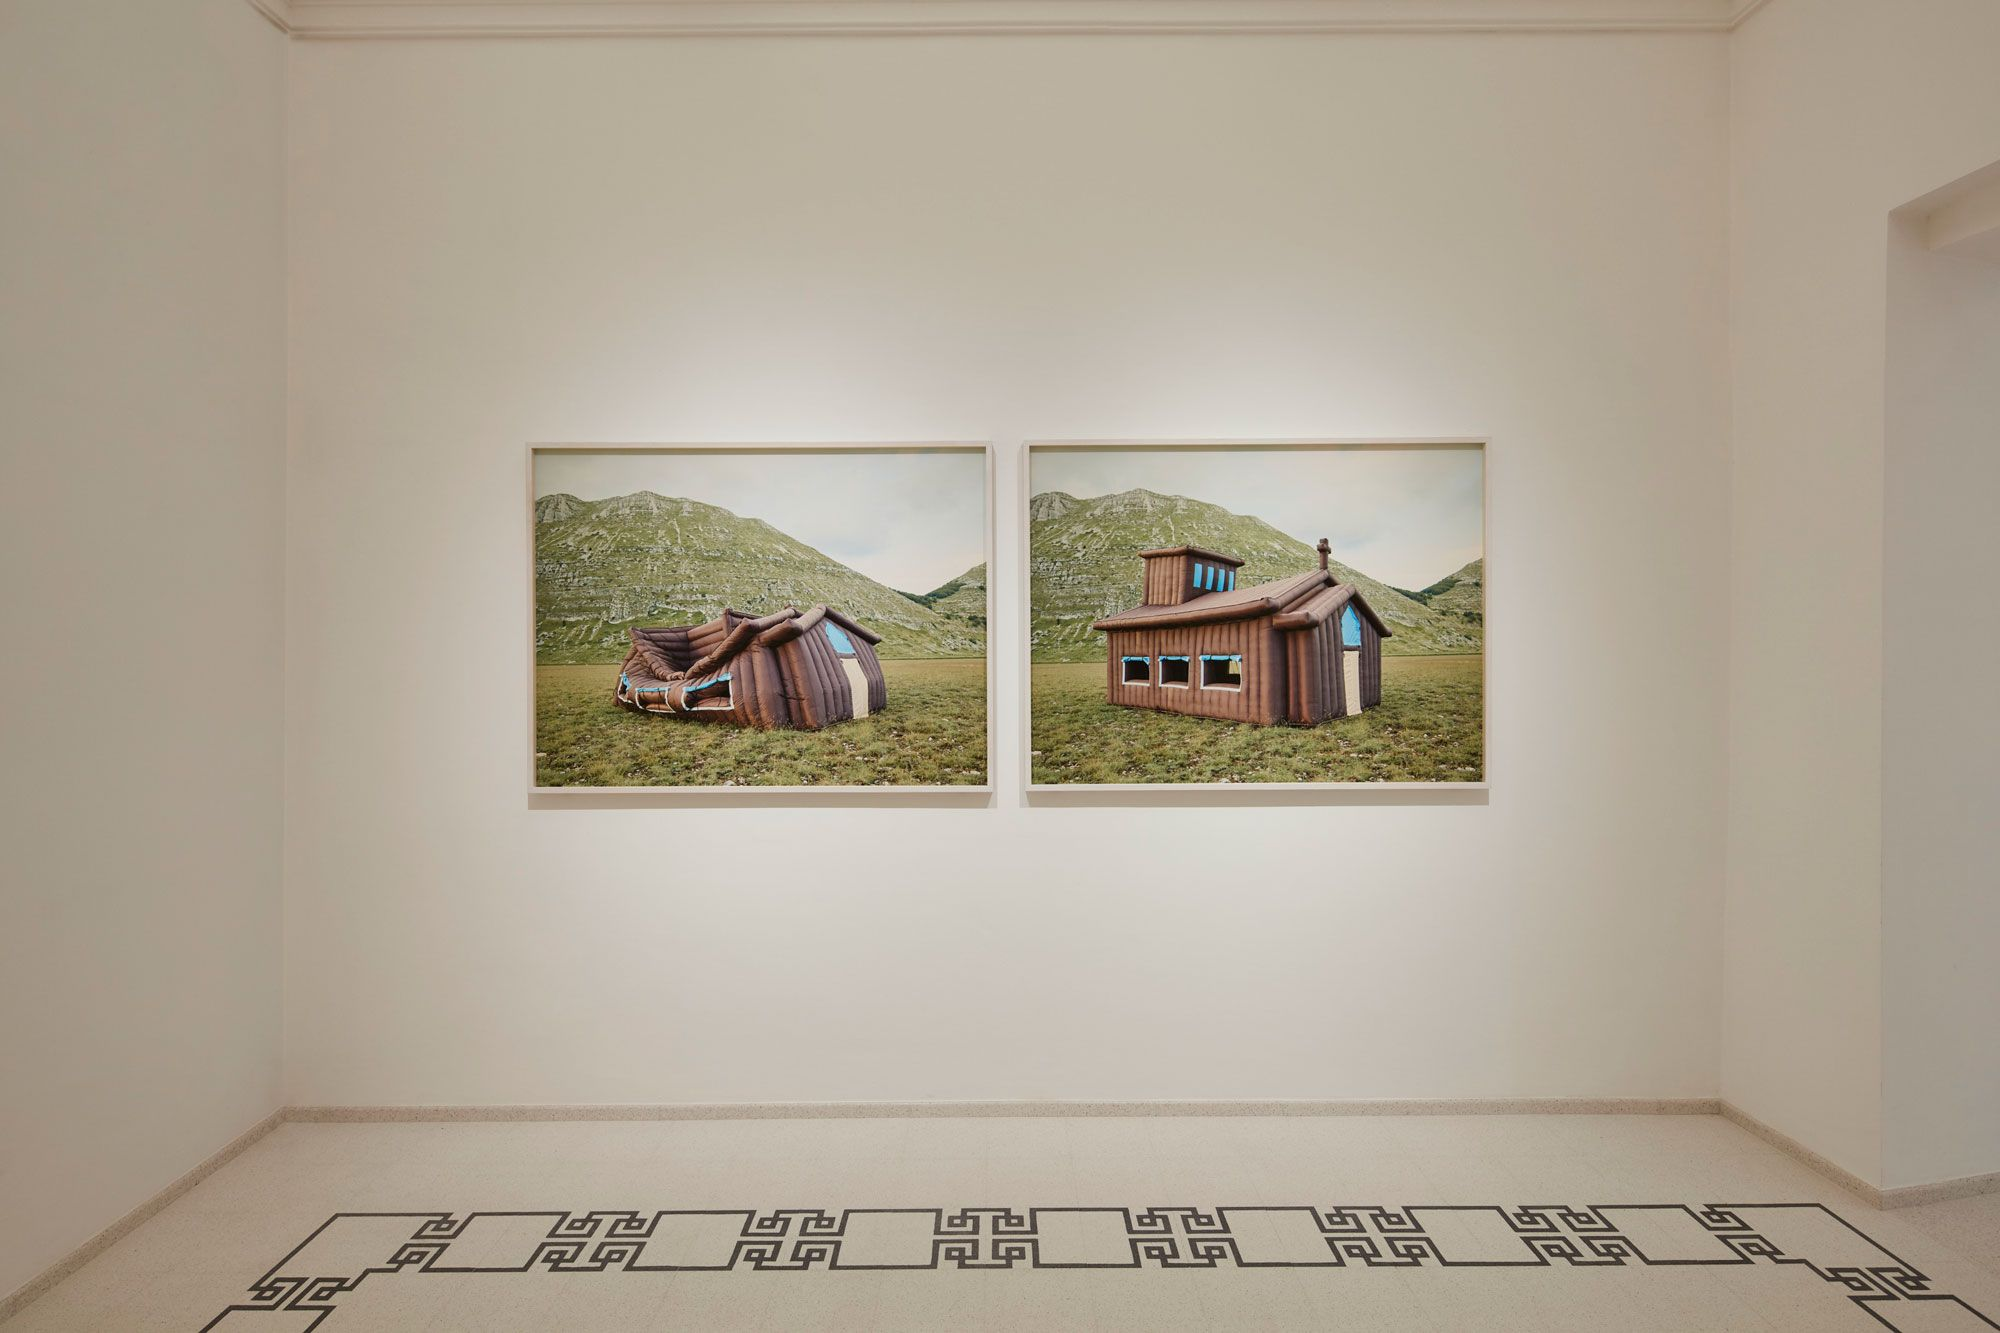 Photographer Stefano Cerio's work Aquila (2020) in the inaugural exhibition at MaXXI L'Aquila